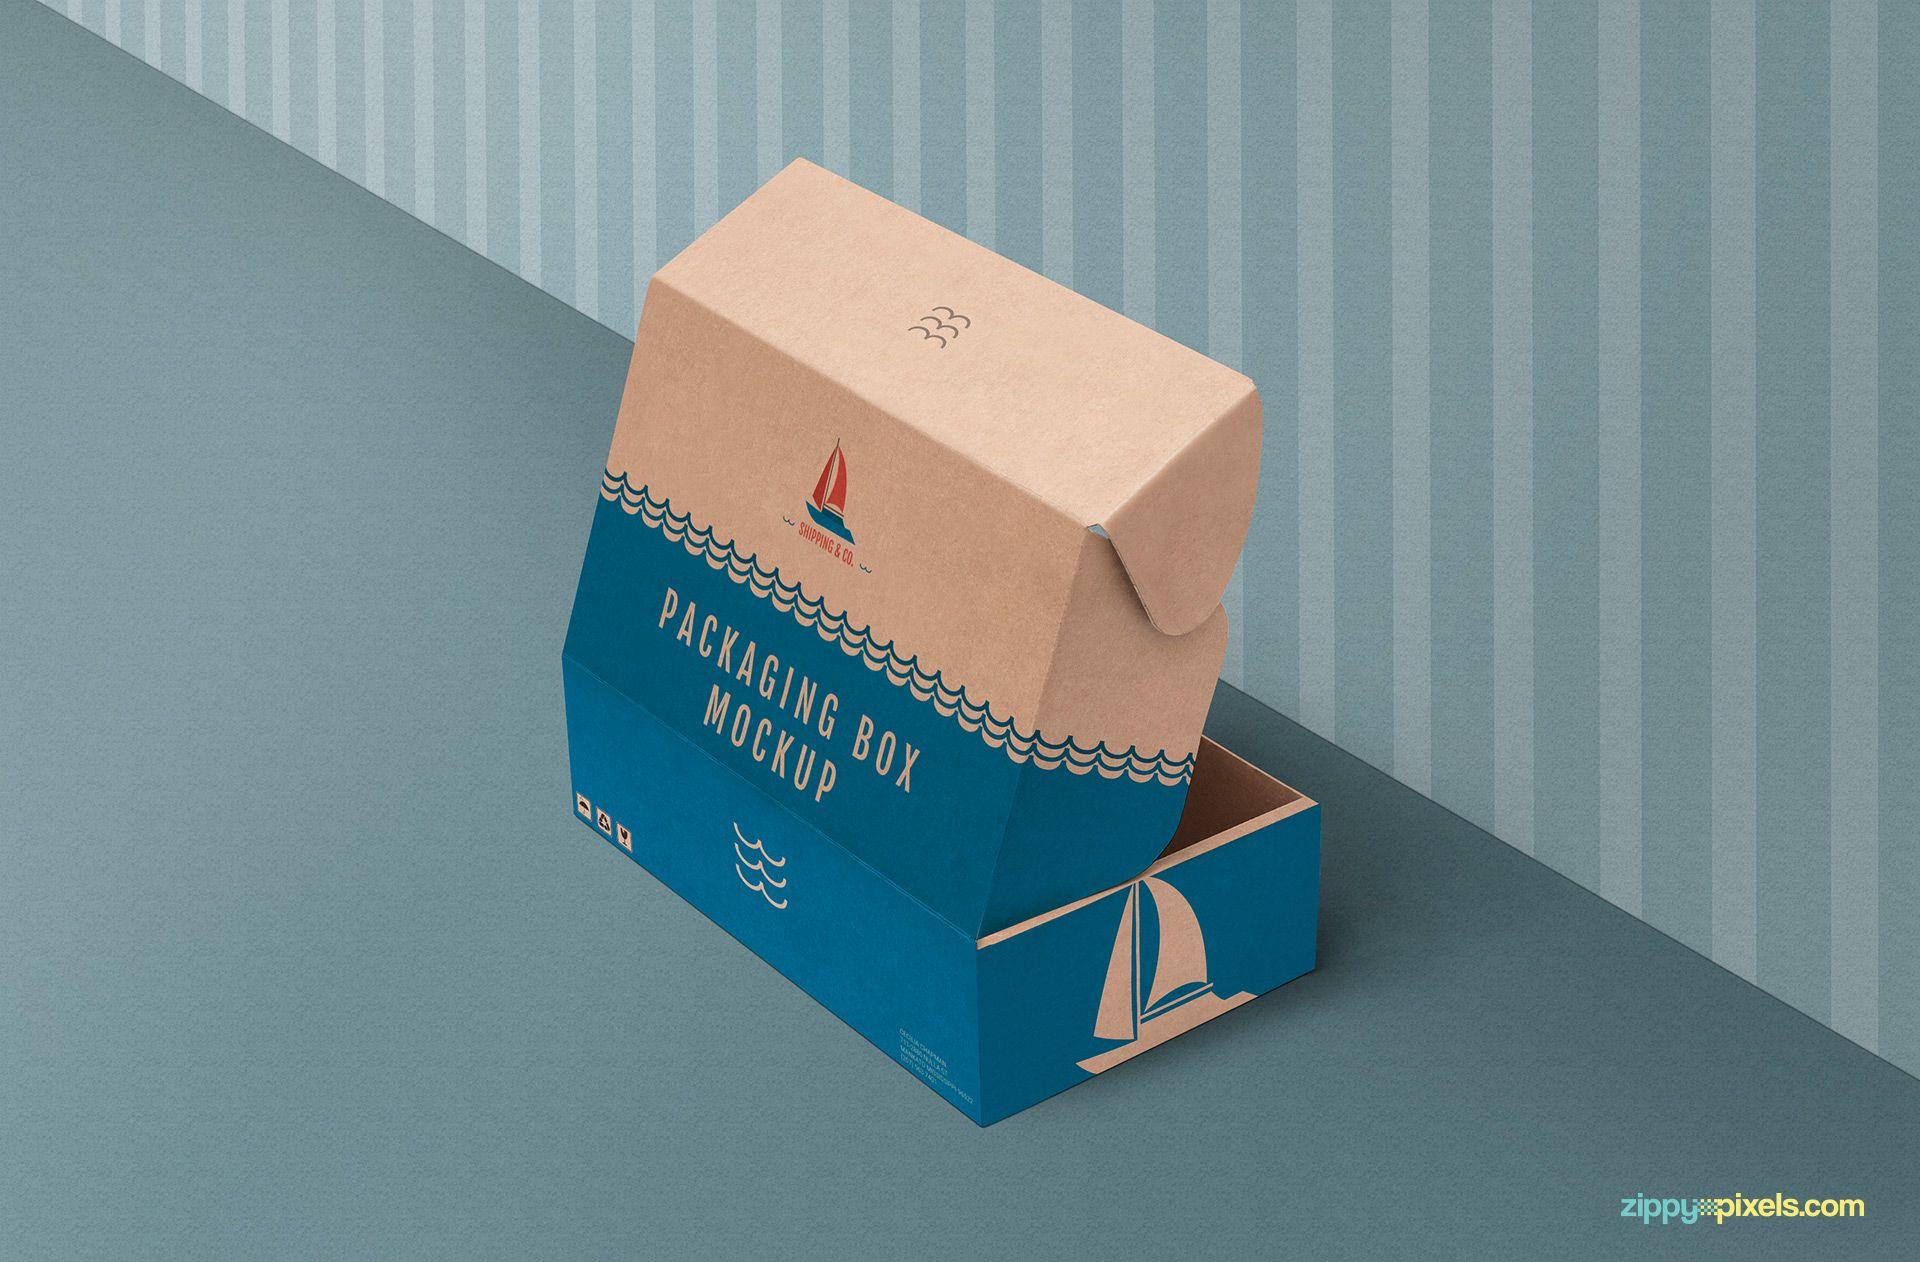 Download Free Product Box Mockup Zippypixels Mockup Box Mockup Packaging Mockup